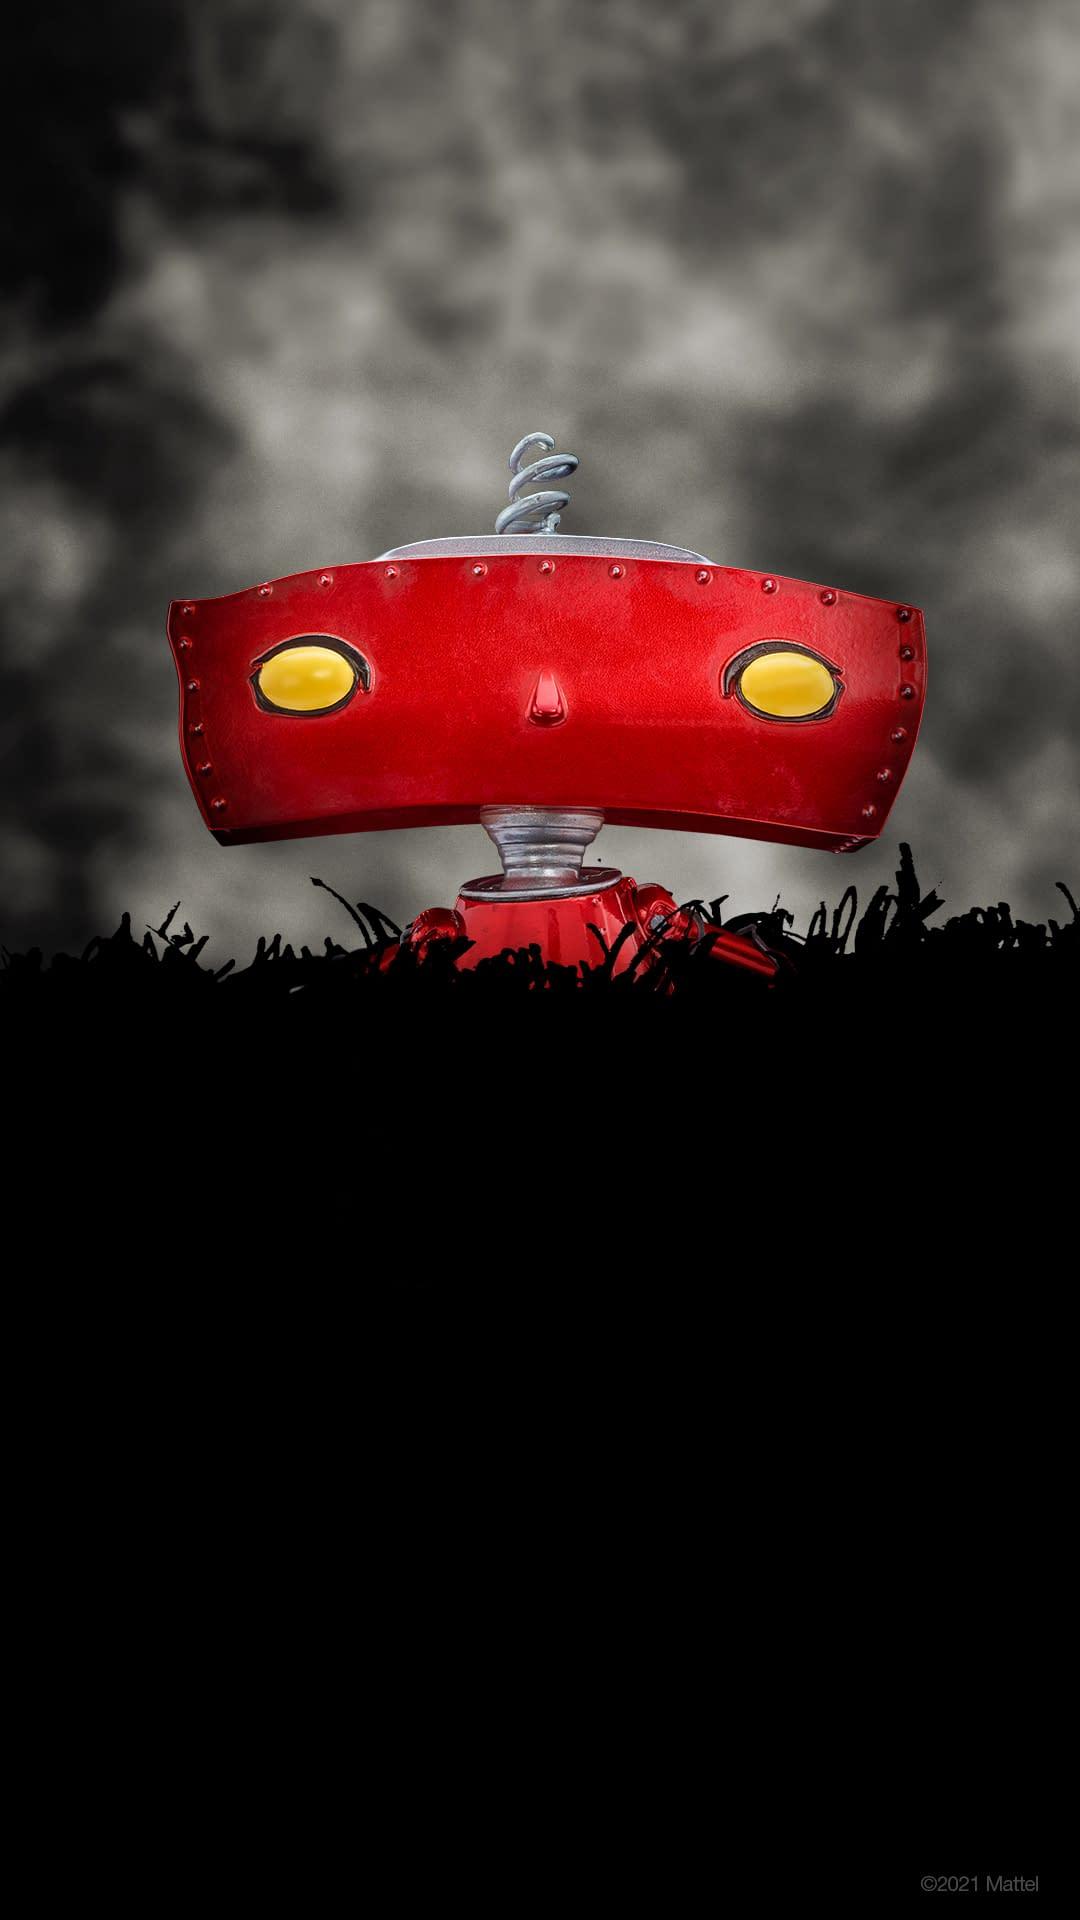 Mattel Creations Is Selling A Bad Robot Figure, JJ Abrams Fans